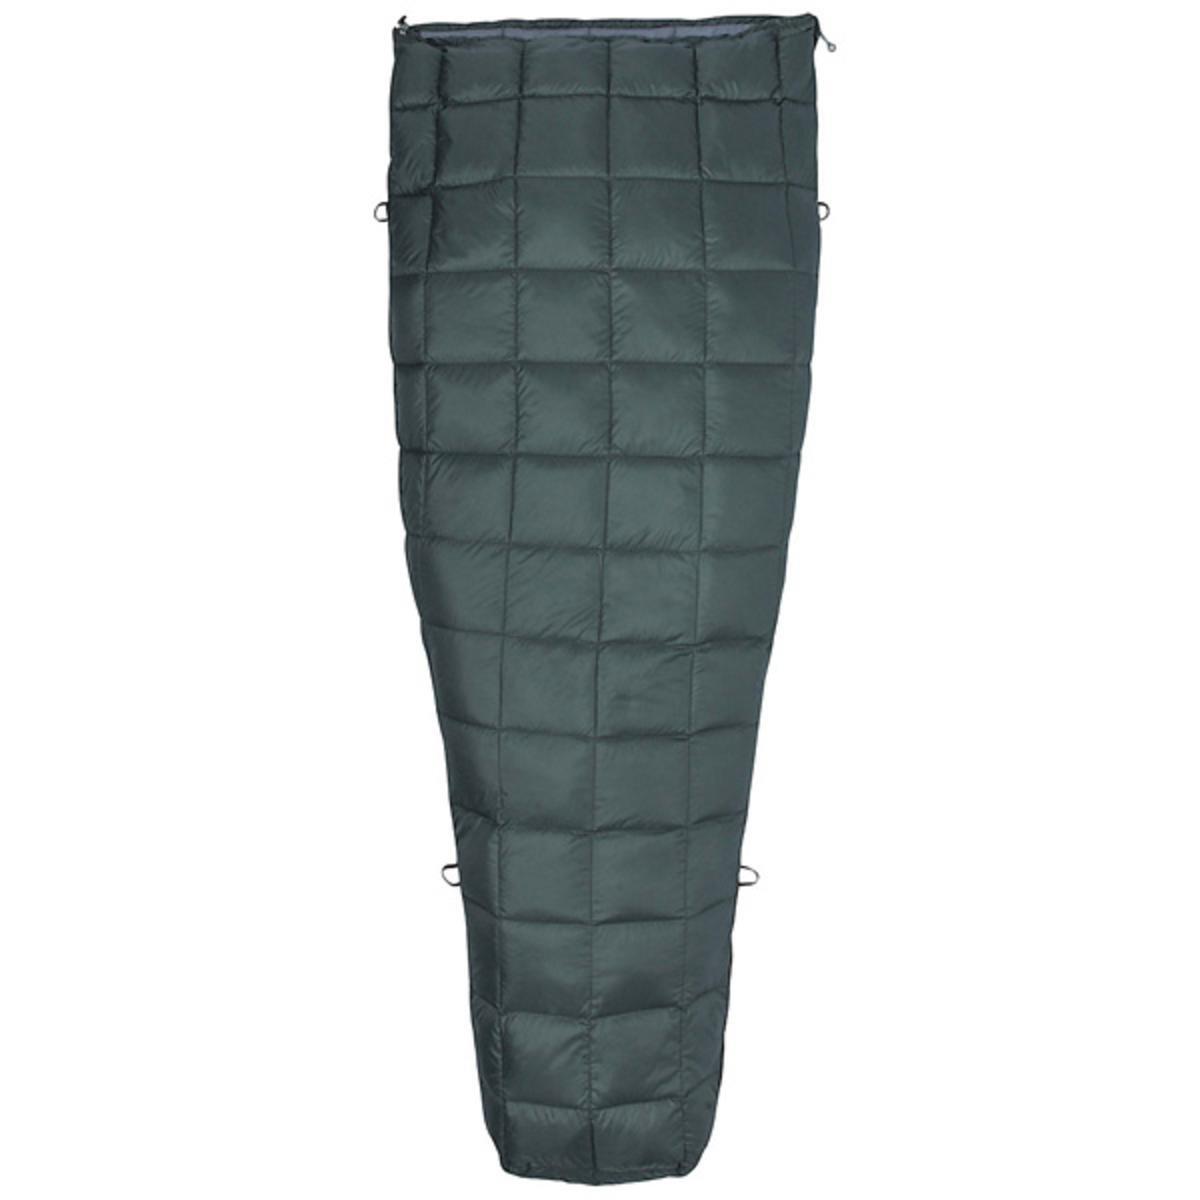 Marmot Micron 50 Sleeping Bag